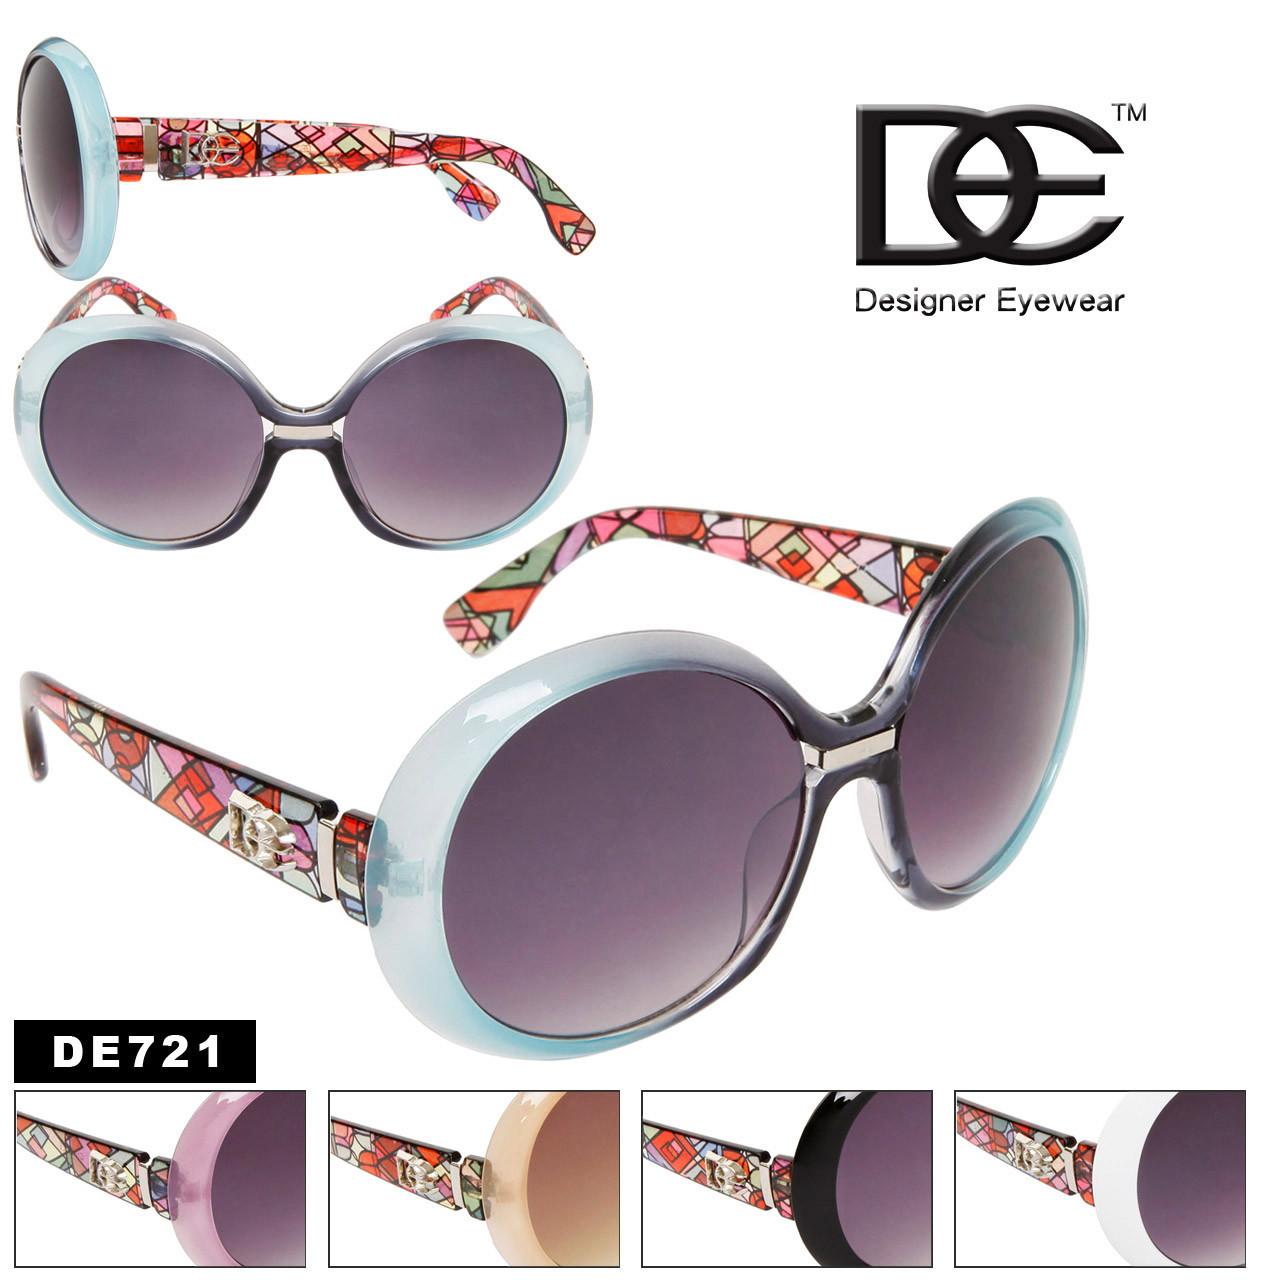 Ladies Fashion Sunglasses DE721